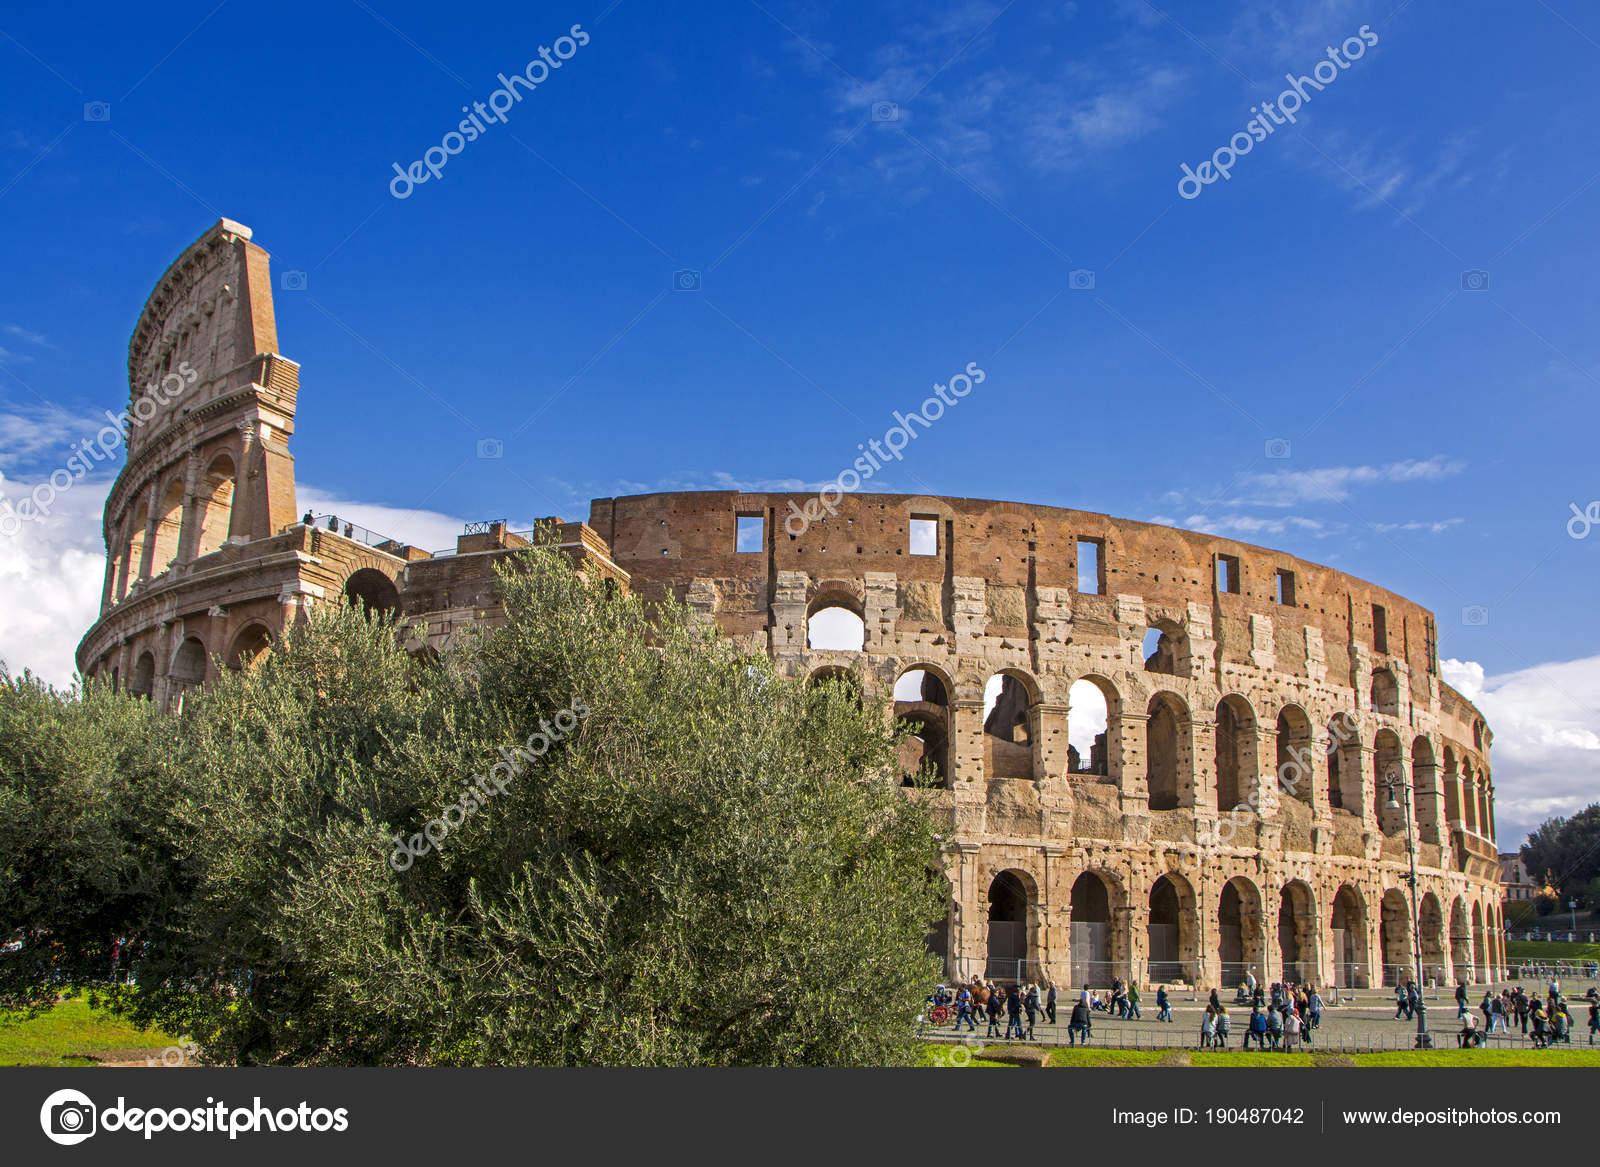 Colosseum coliseum rome italy main travel attraction rome colosseum colosseum coliseum rome italy main travel attraction rome colosseum sunlight stock photo publicscrutiny Images